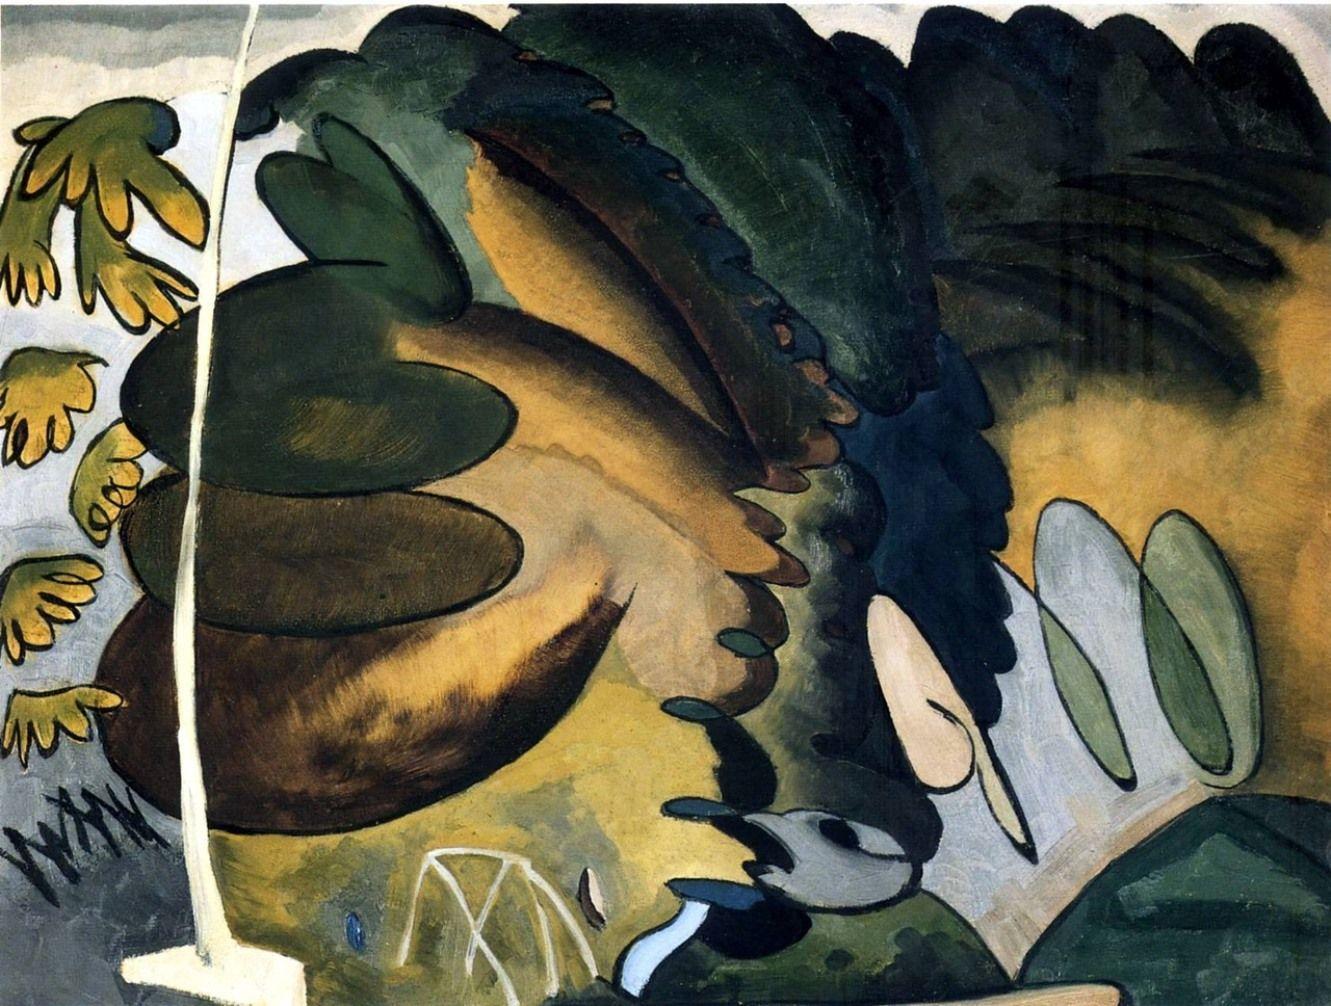 Arthur Dove(USA) アーサー・ダヴ(米) | 抽象絵画, アート, アーサー